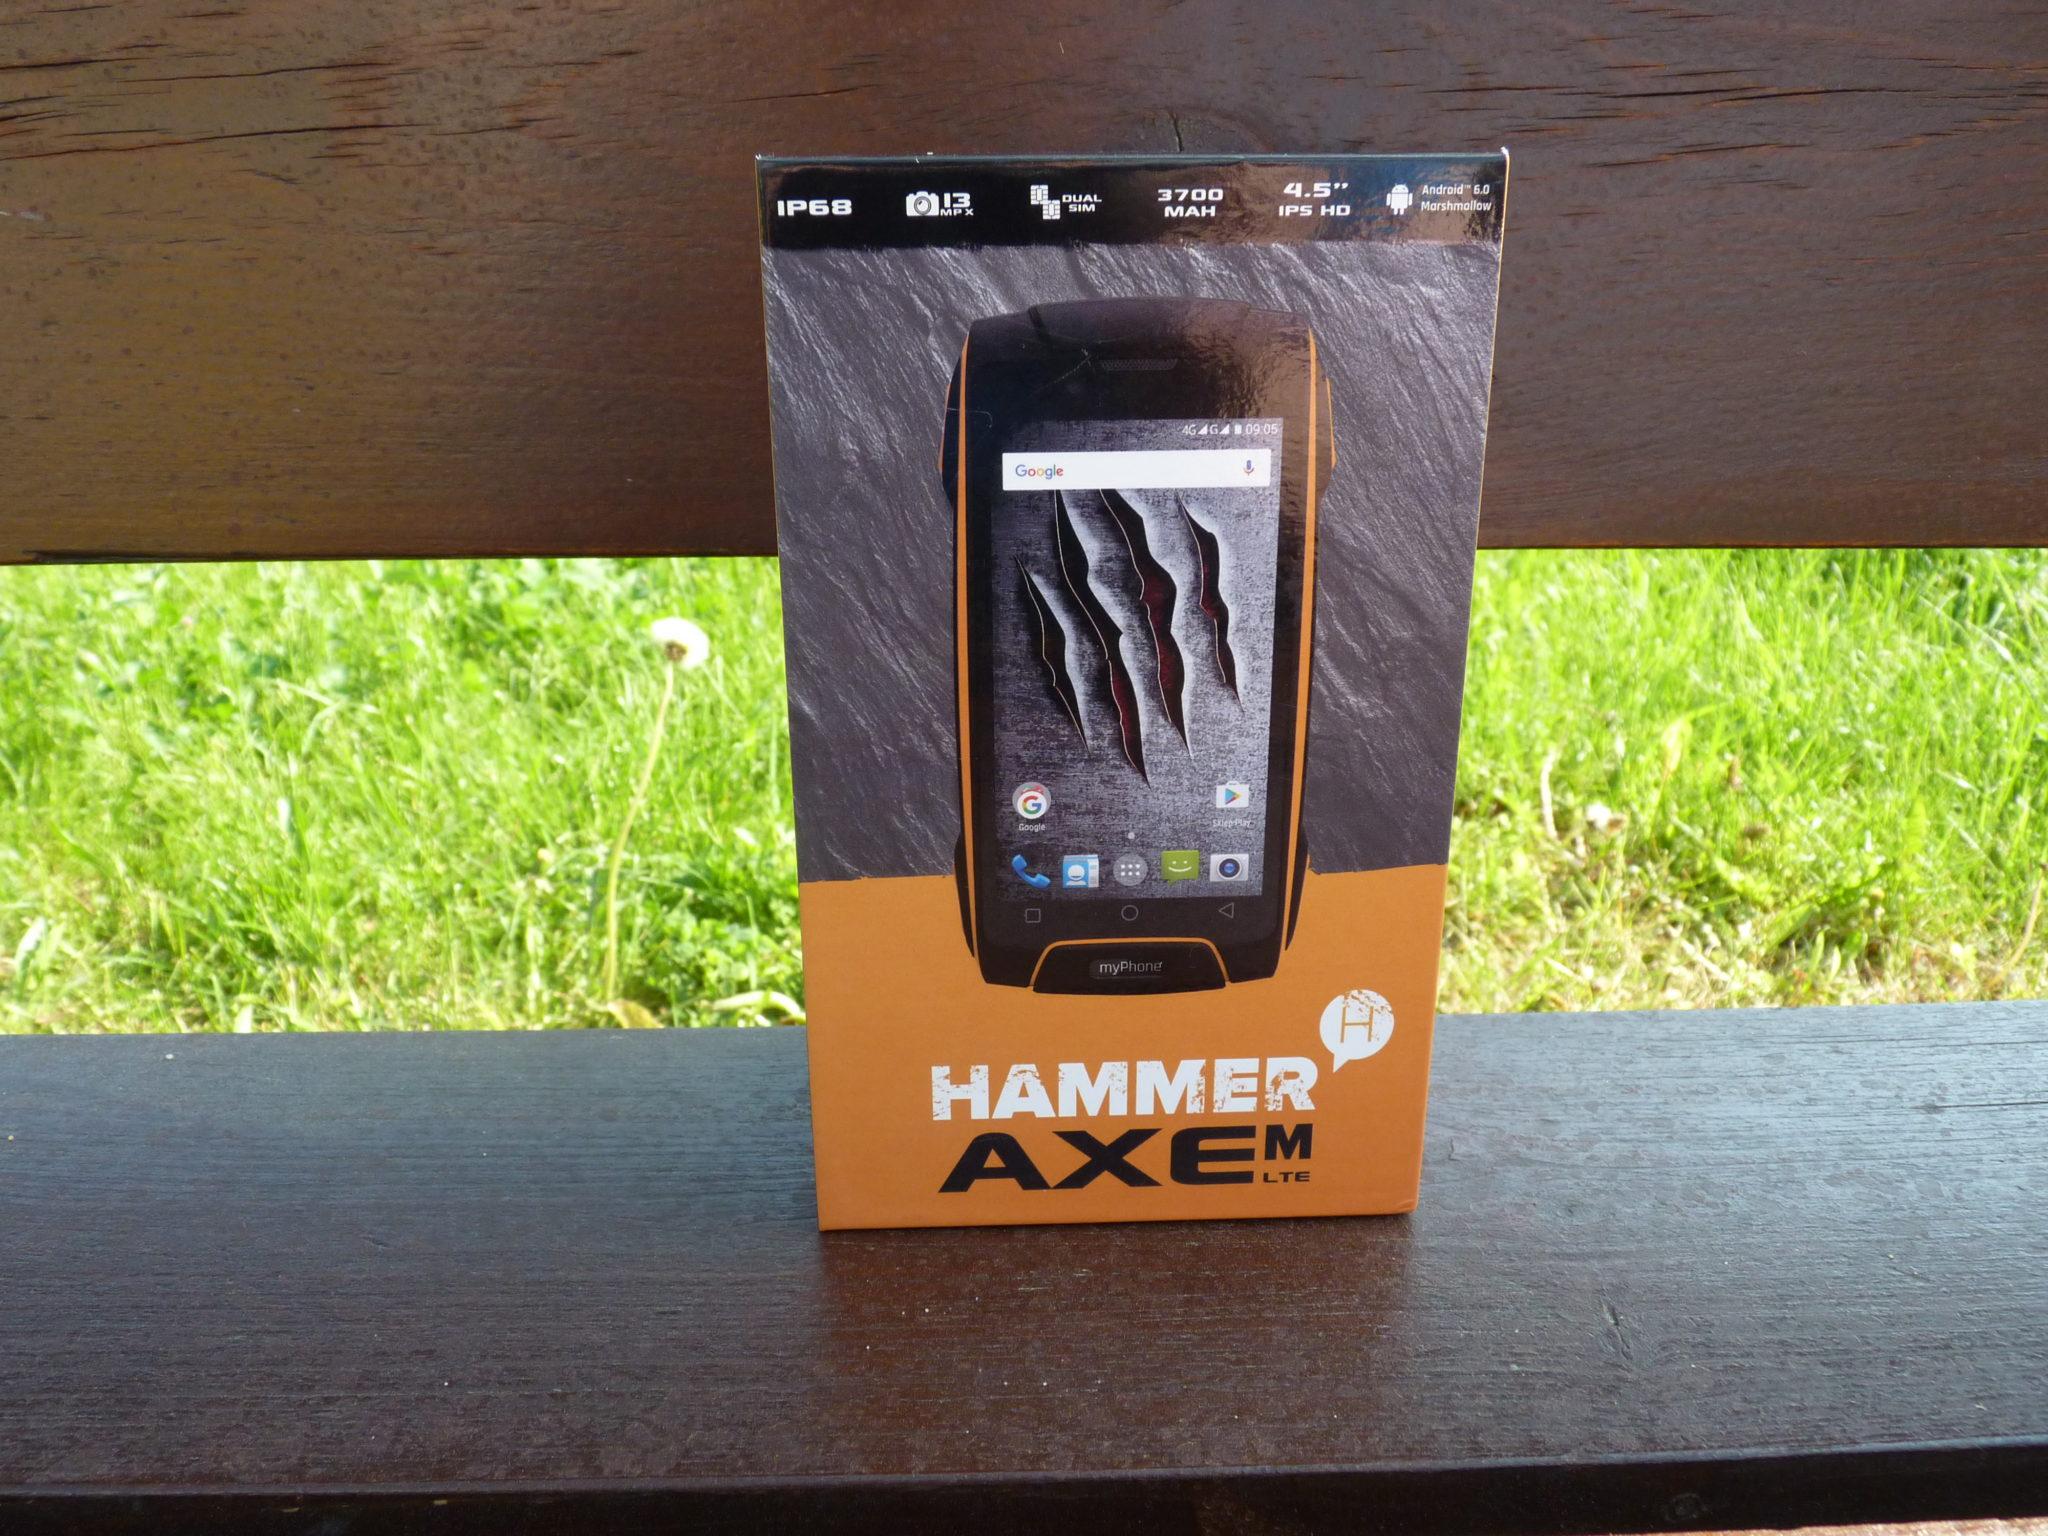 ca63fda38dc3 Recenzja smartfona myPhone Hammer AXE M LTE